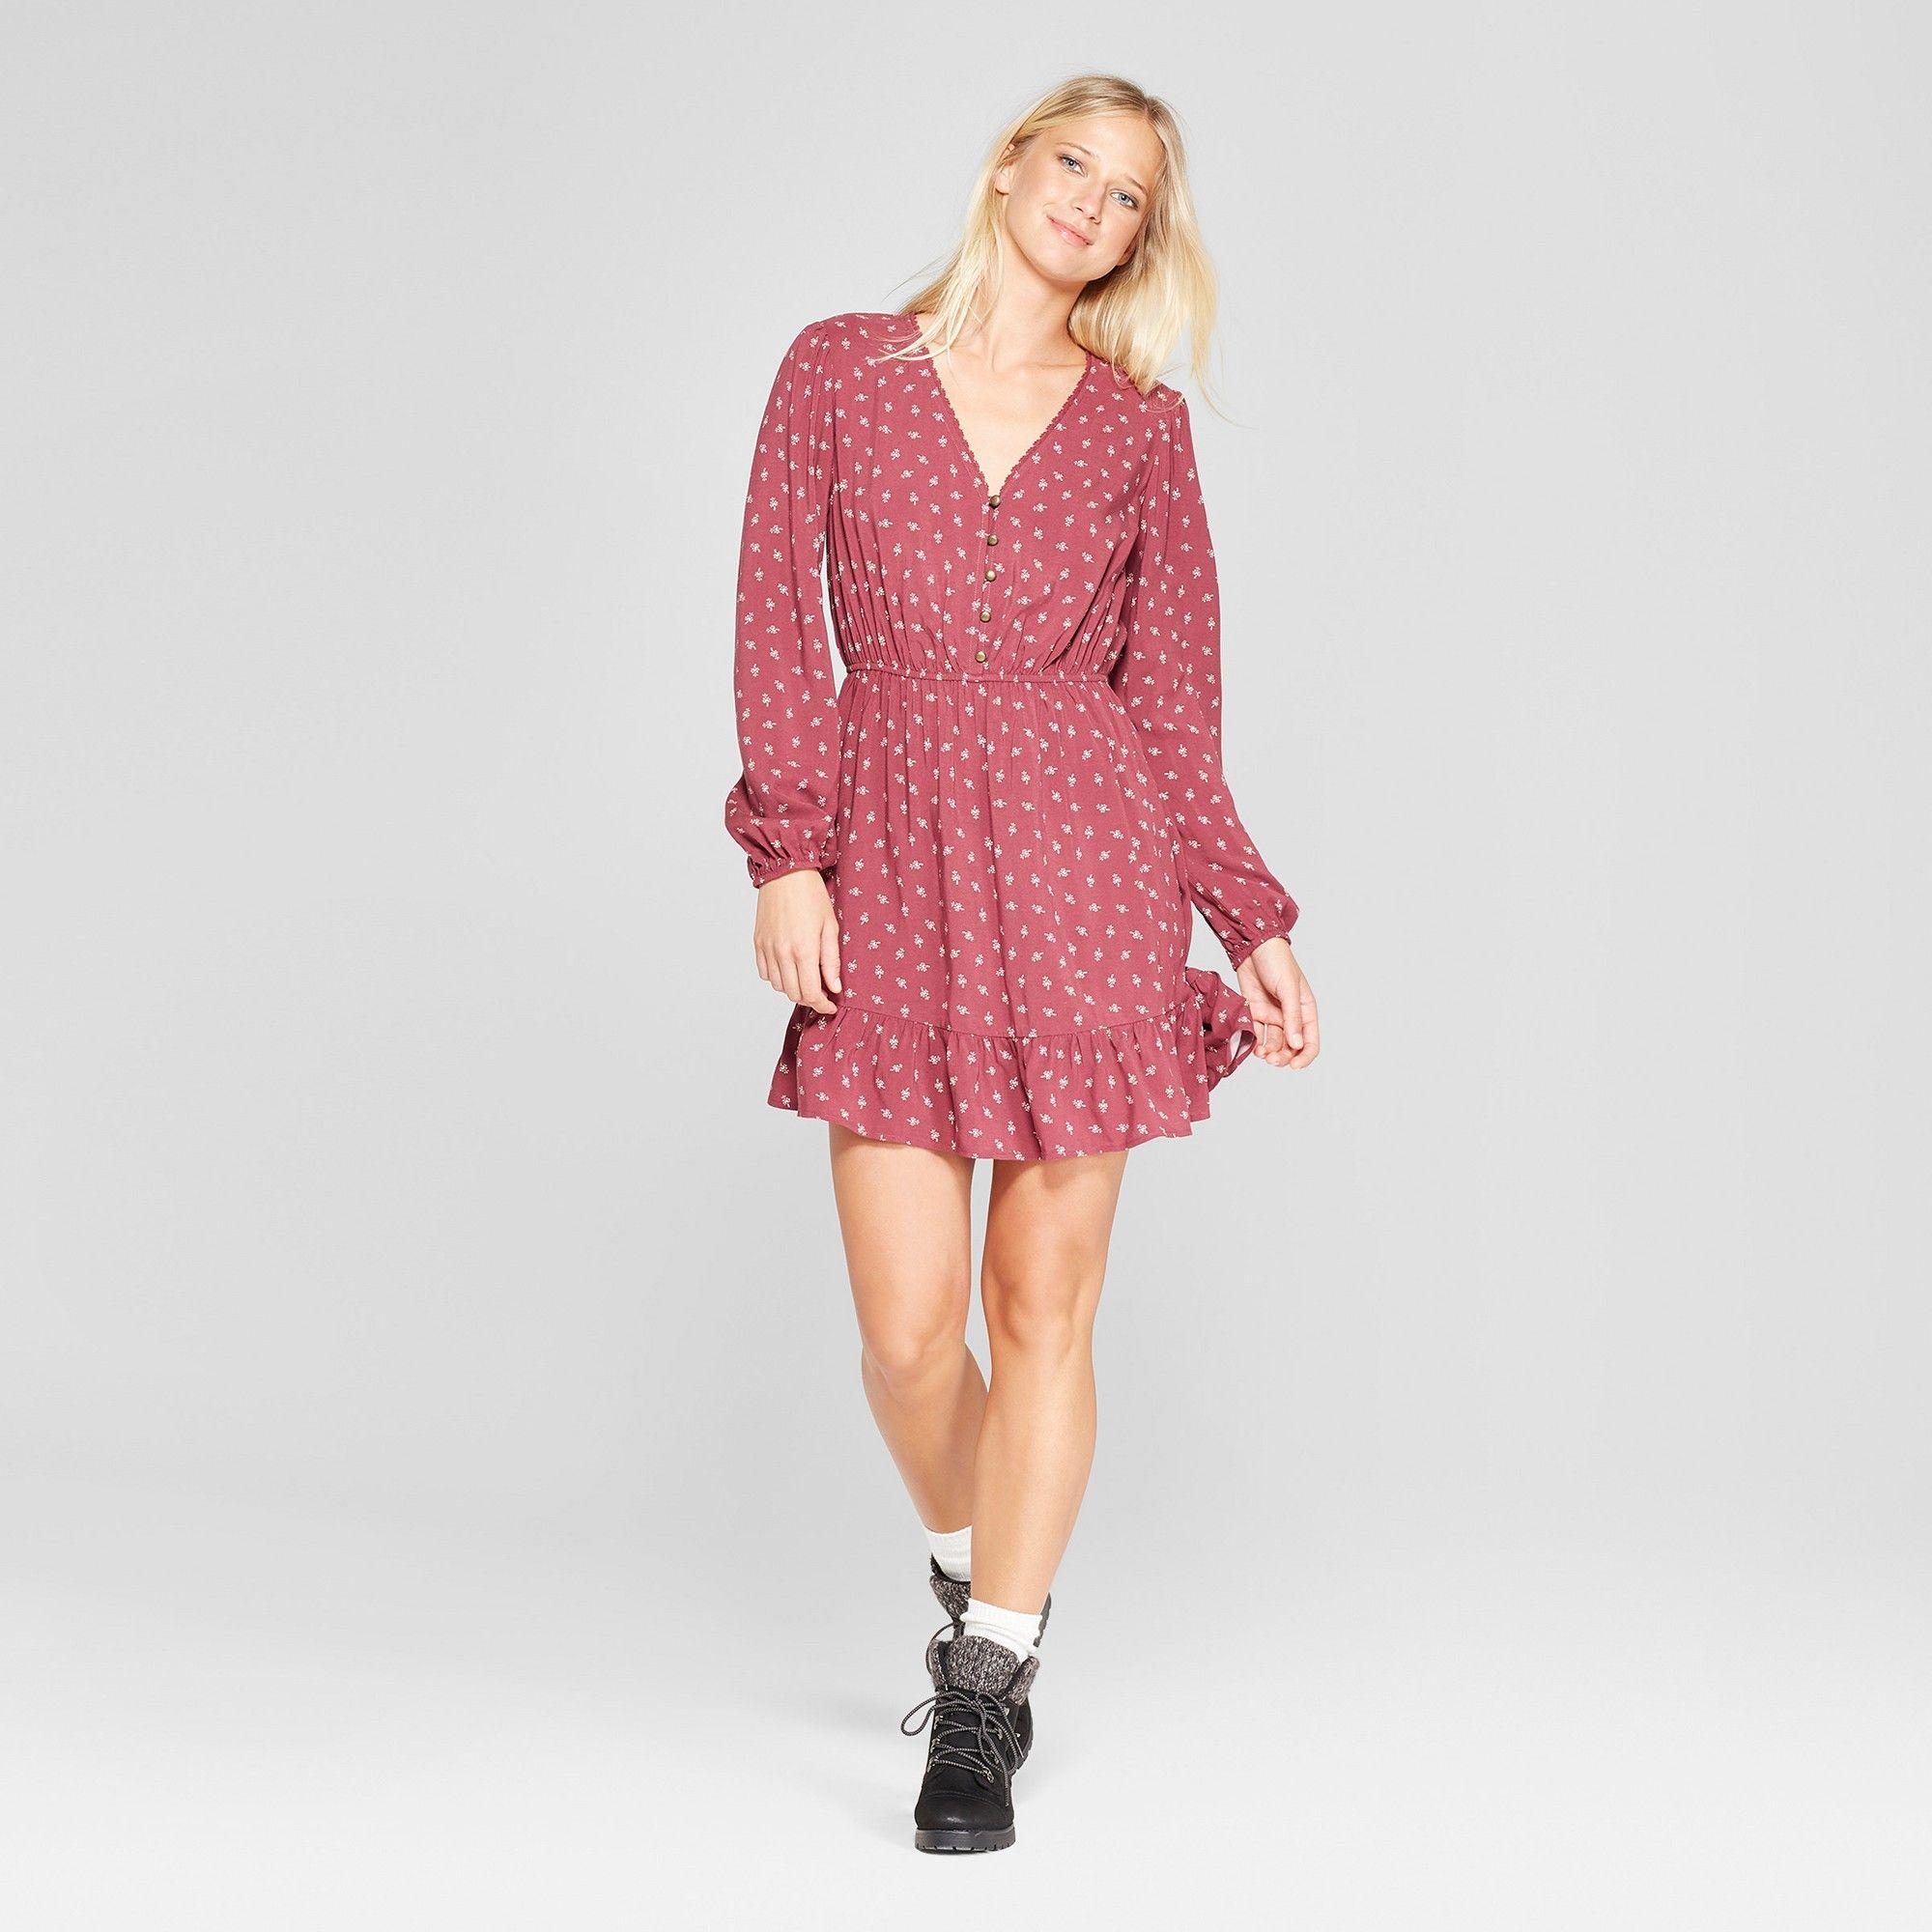 cd65c036bacf Women s Floral Print Long Sleeve Button Front Woven Dress - Xhilaration  Mauve (Pink) Xxl